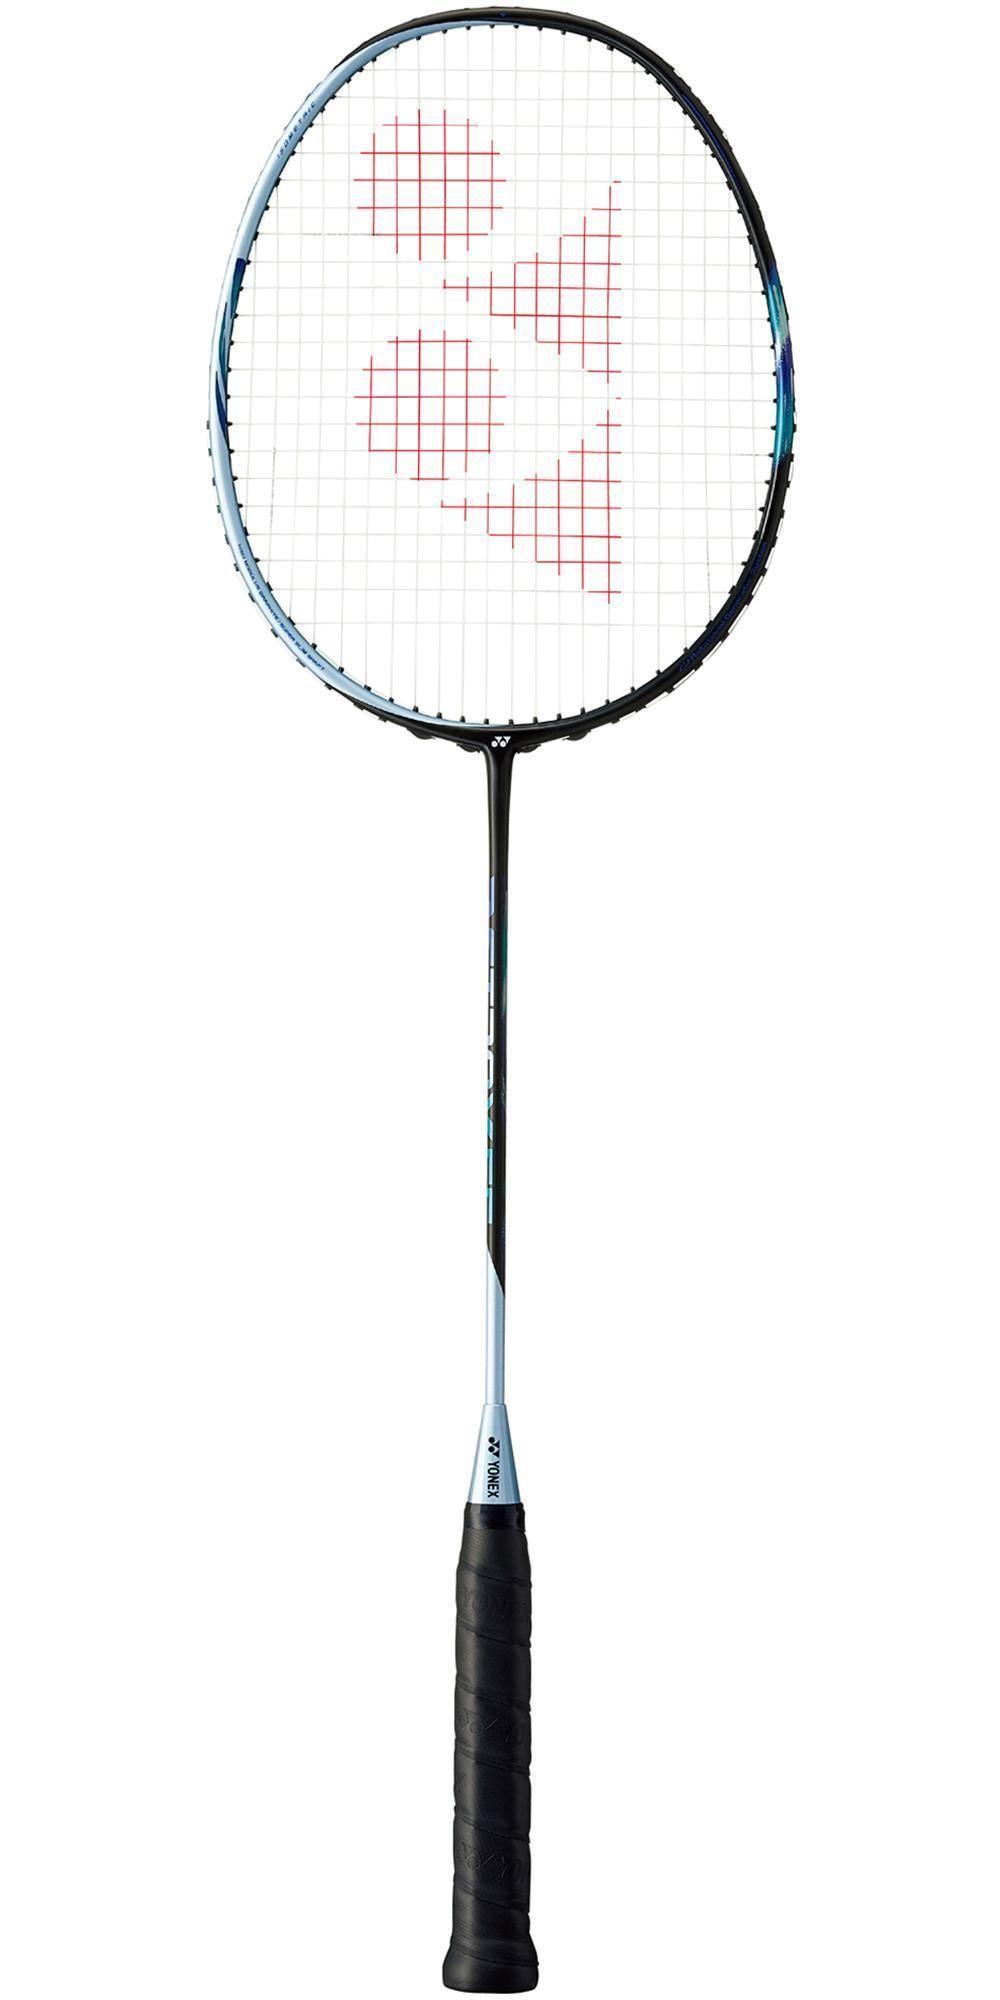 Yonex Astrox 55 Badminton Racket Badminton Racket Badminton Rackets